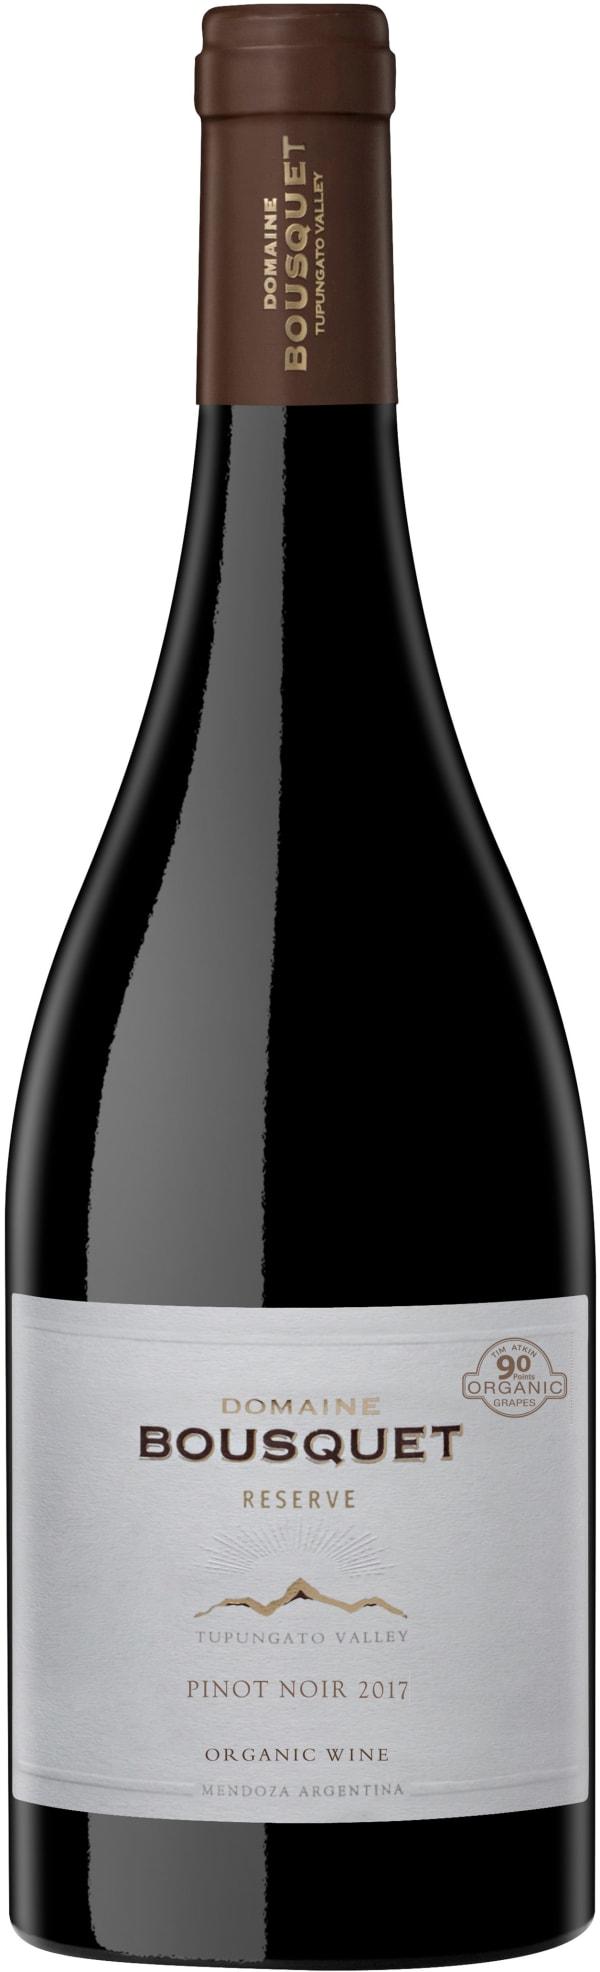 Domaine Bousquet Reserve Organic Pinot Noir 2017